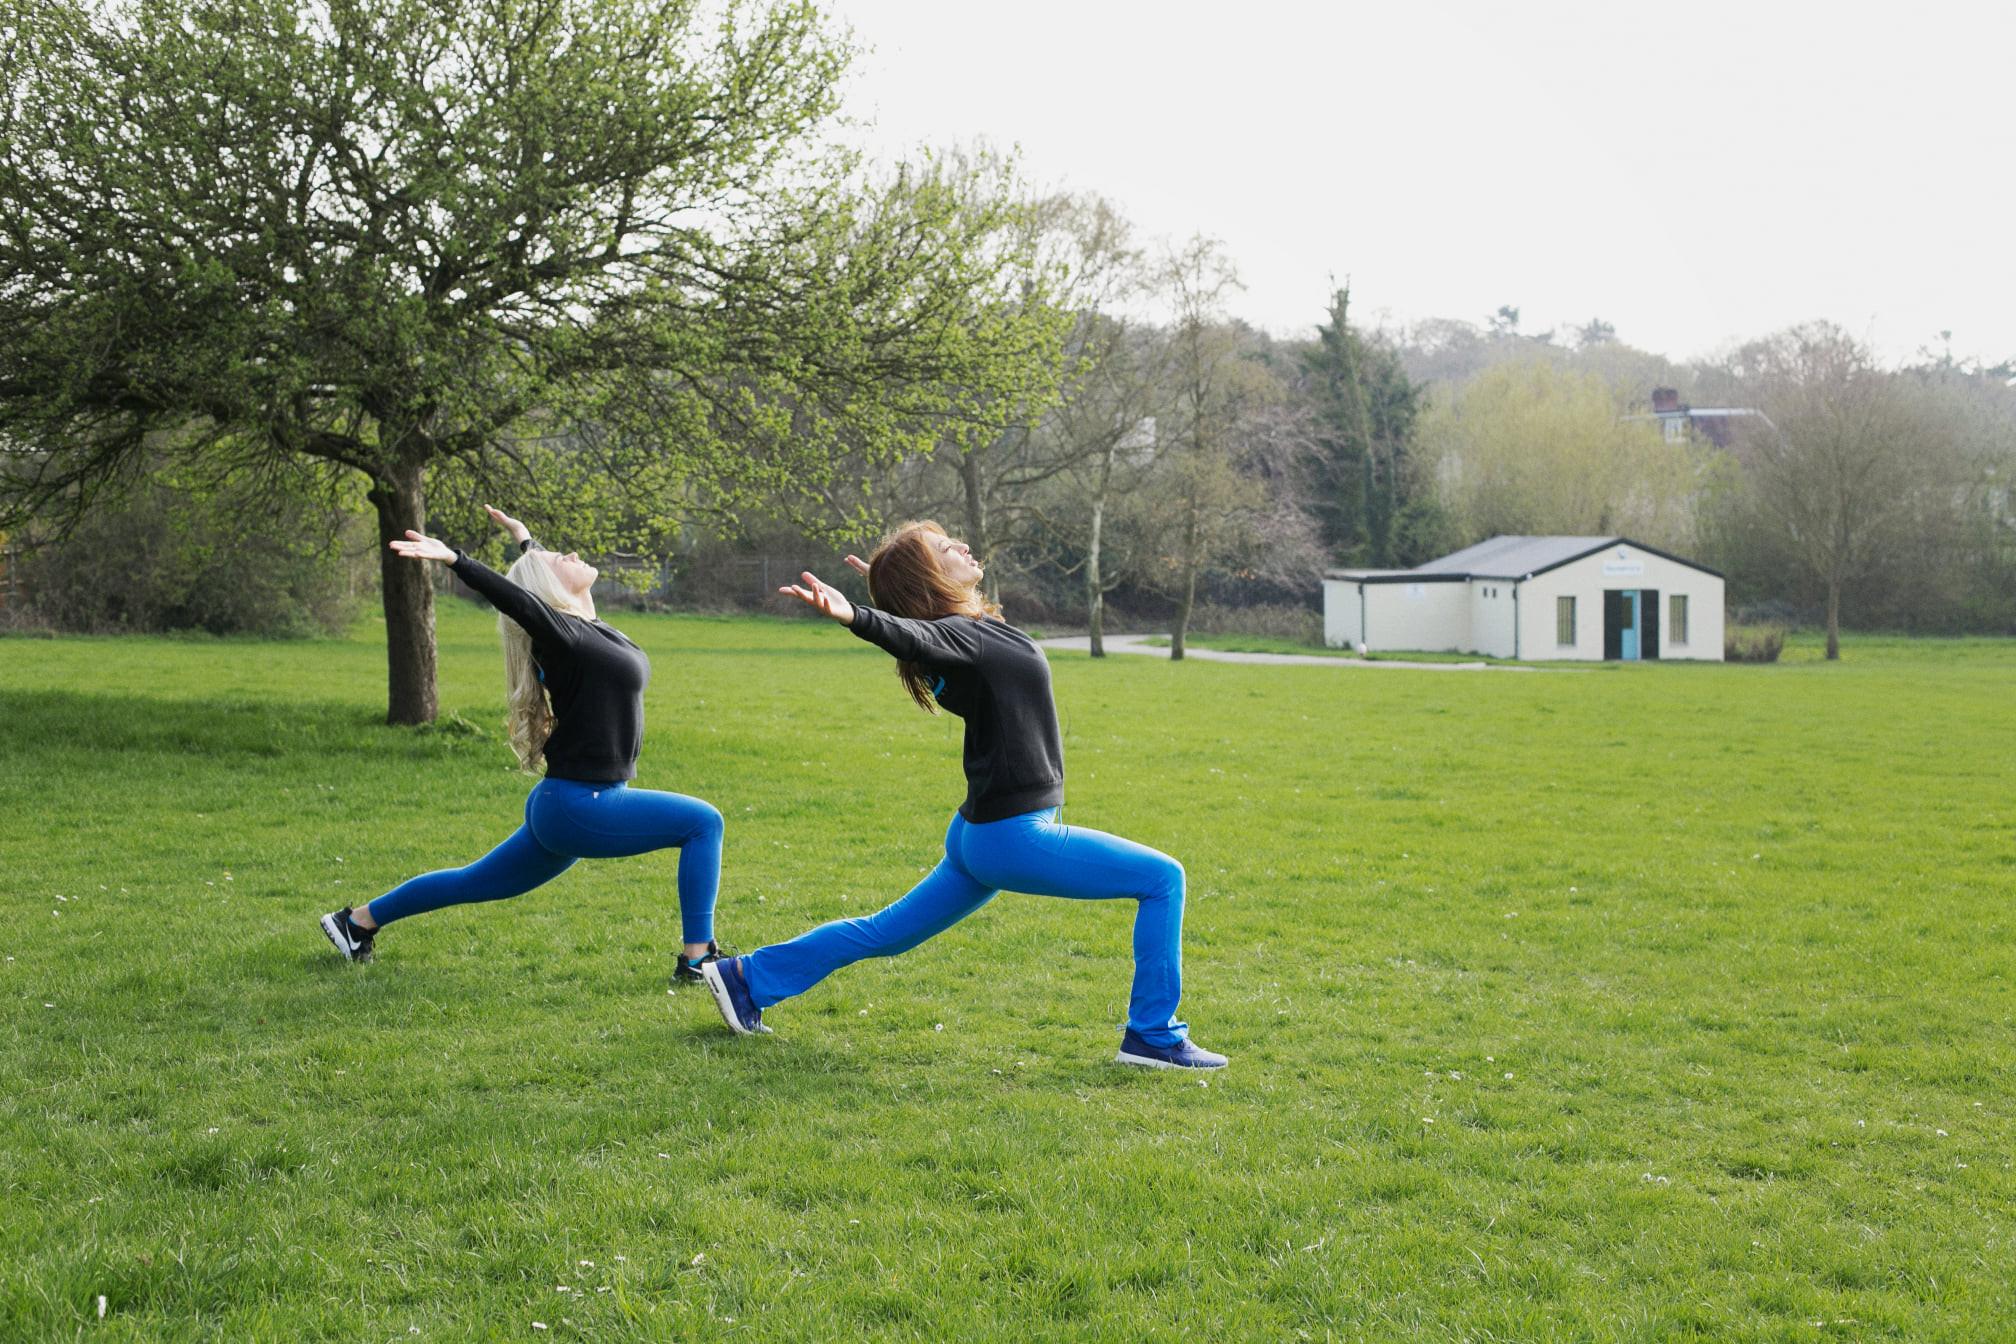 Nature's Rhythm in the Park (Ridgeway)